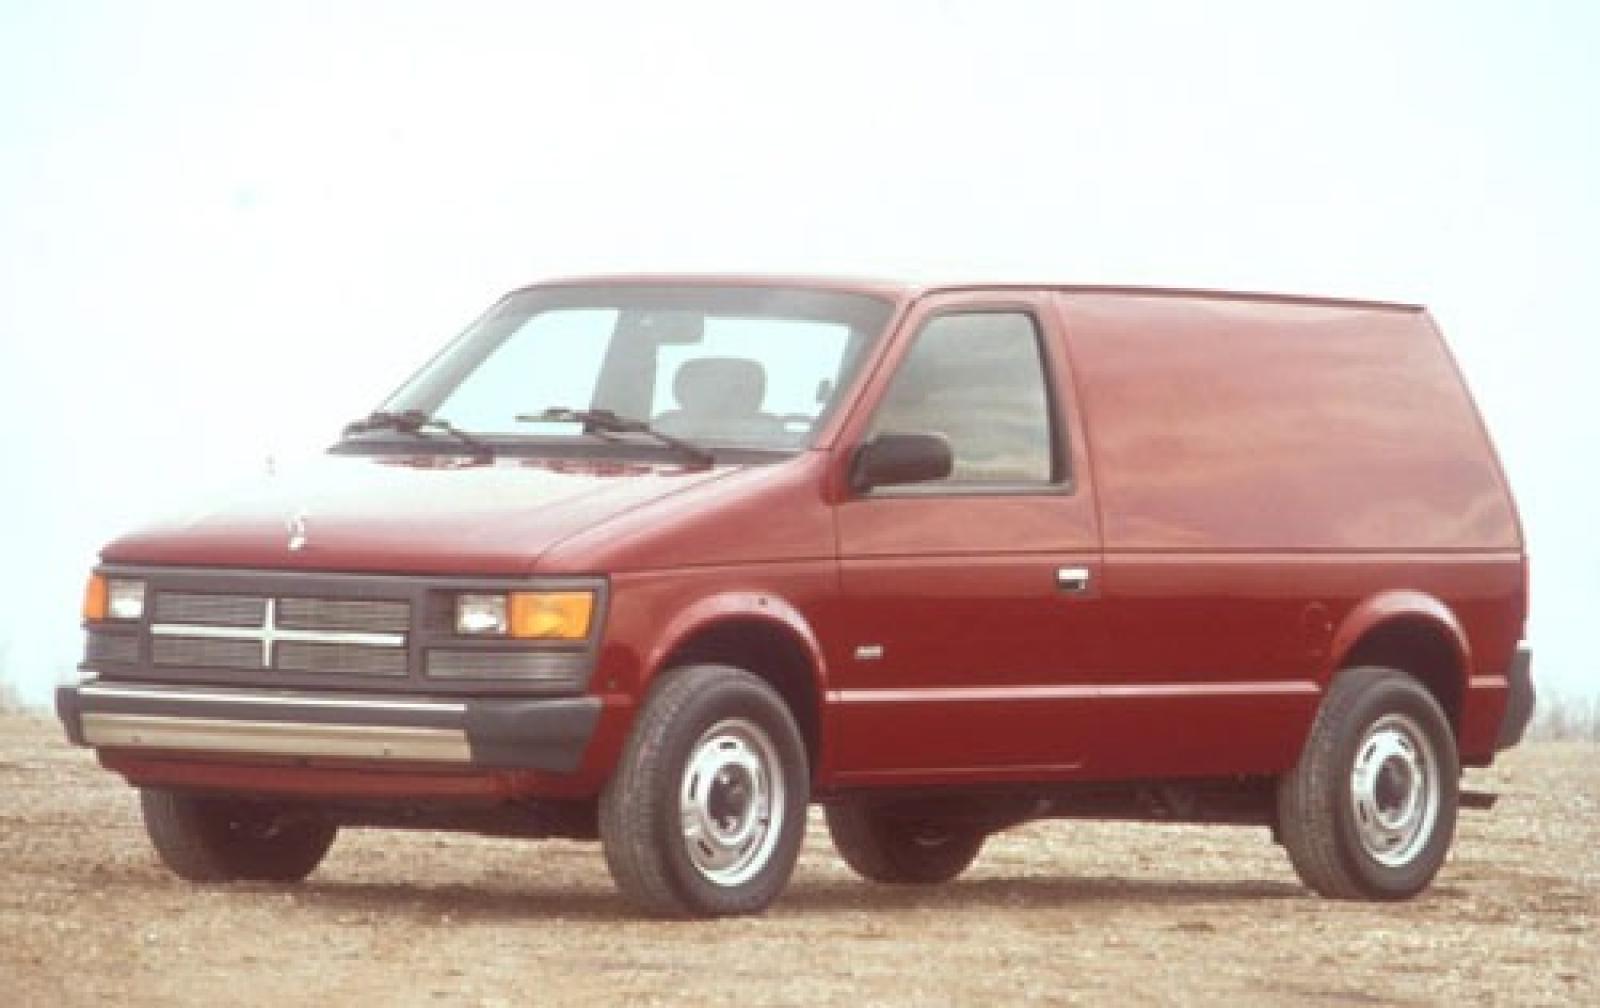 800 1024 1280 1600 origin 1992 dodge caravan